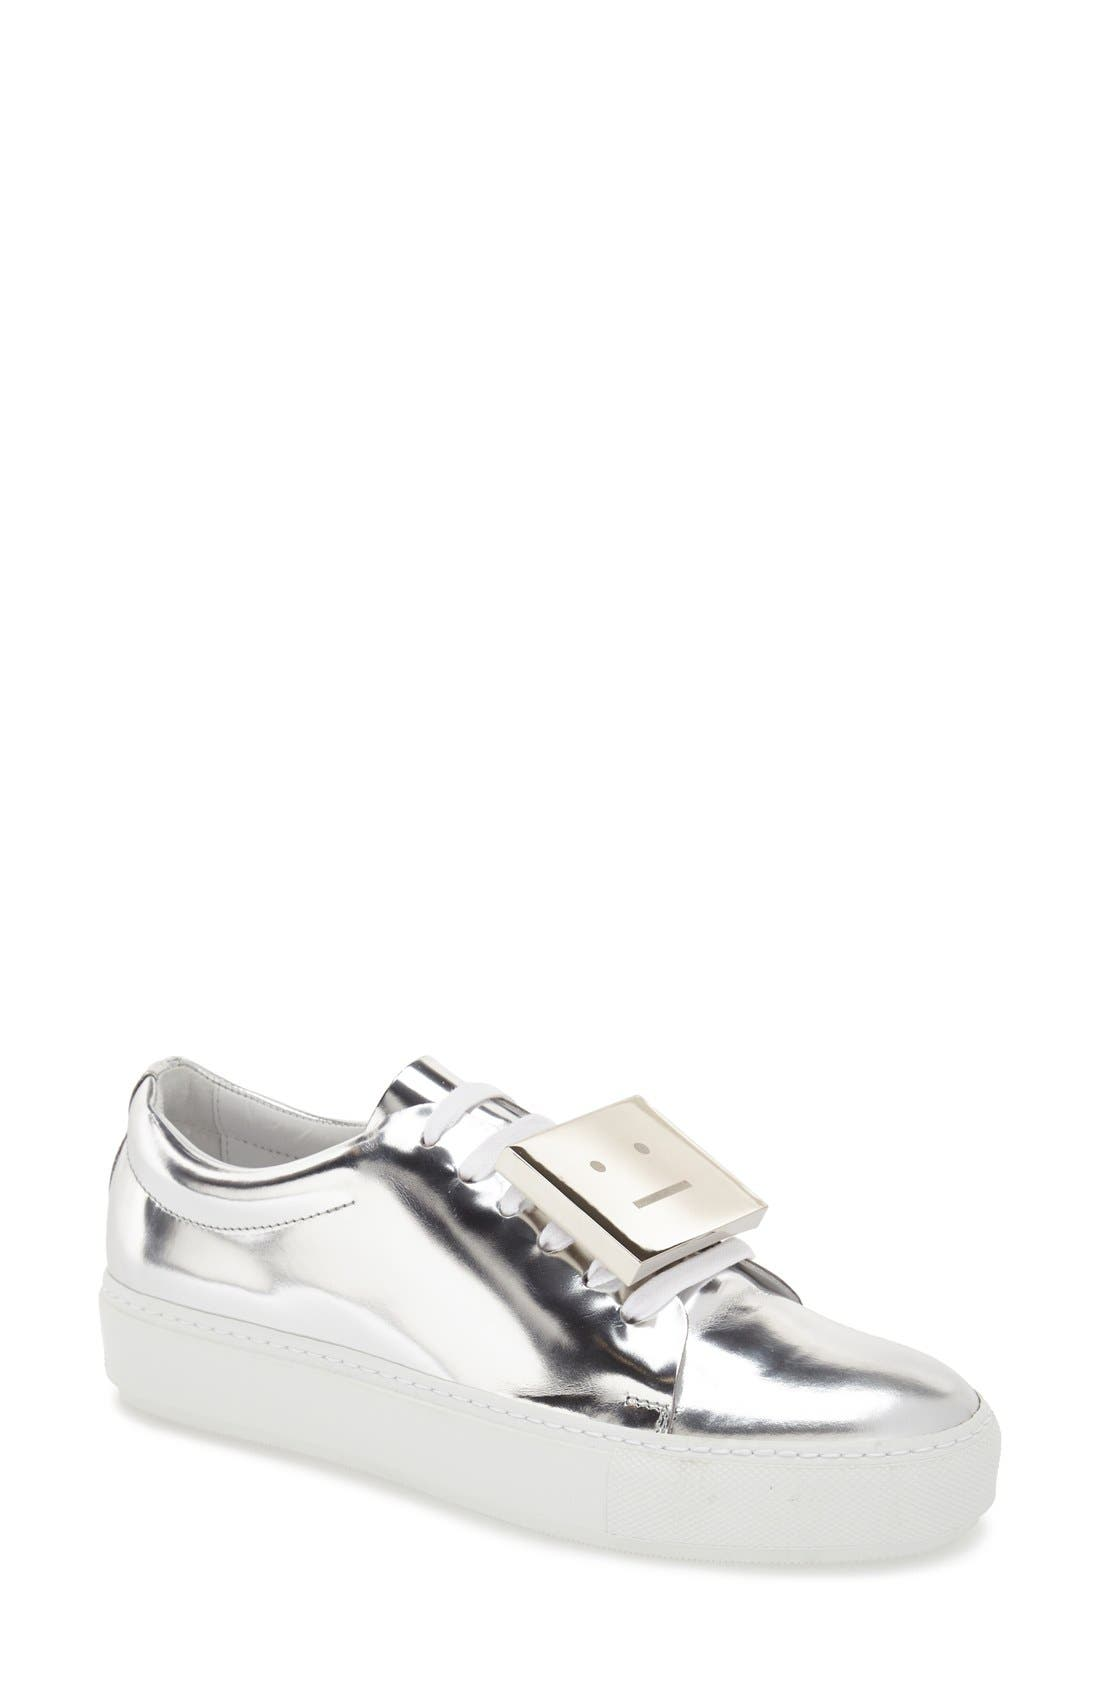 ACNE STUDIOS Adriana Silver Metallic Sneaker